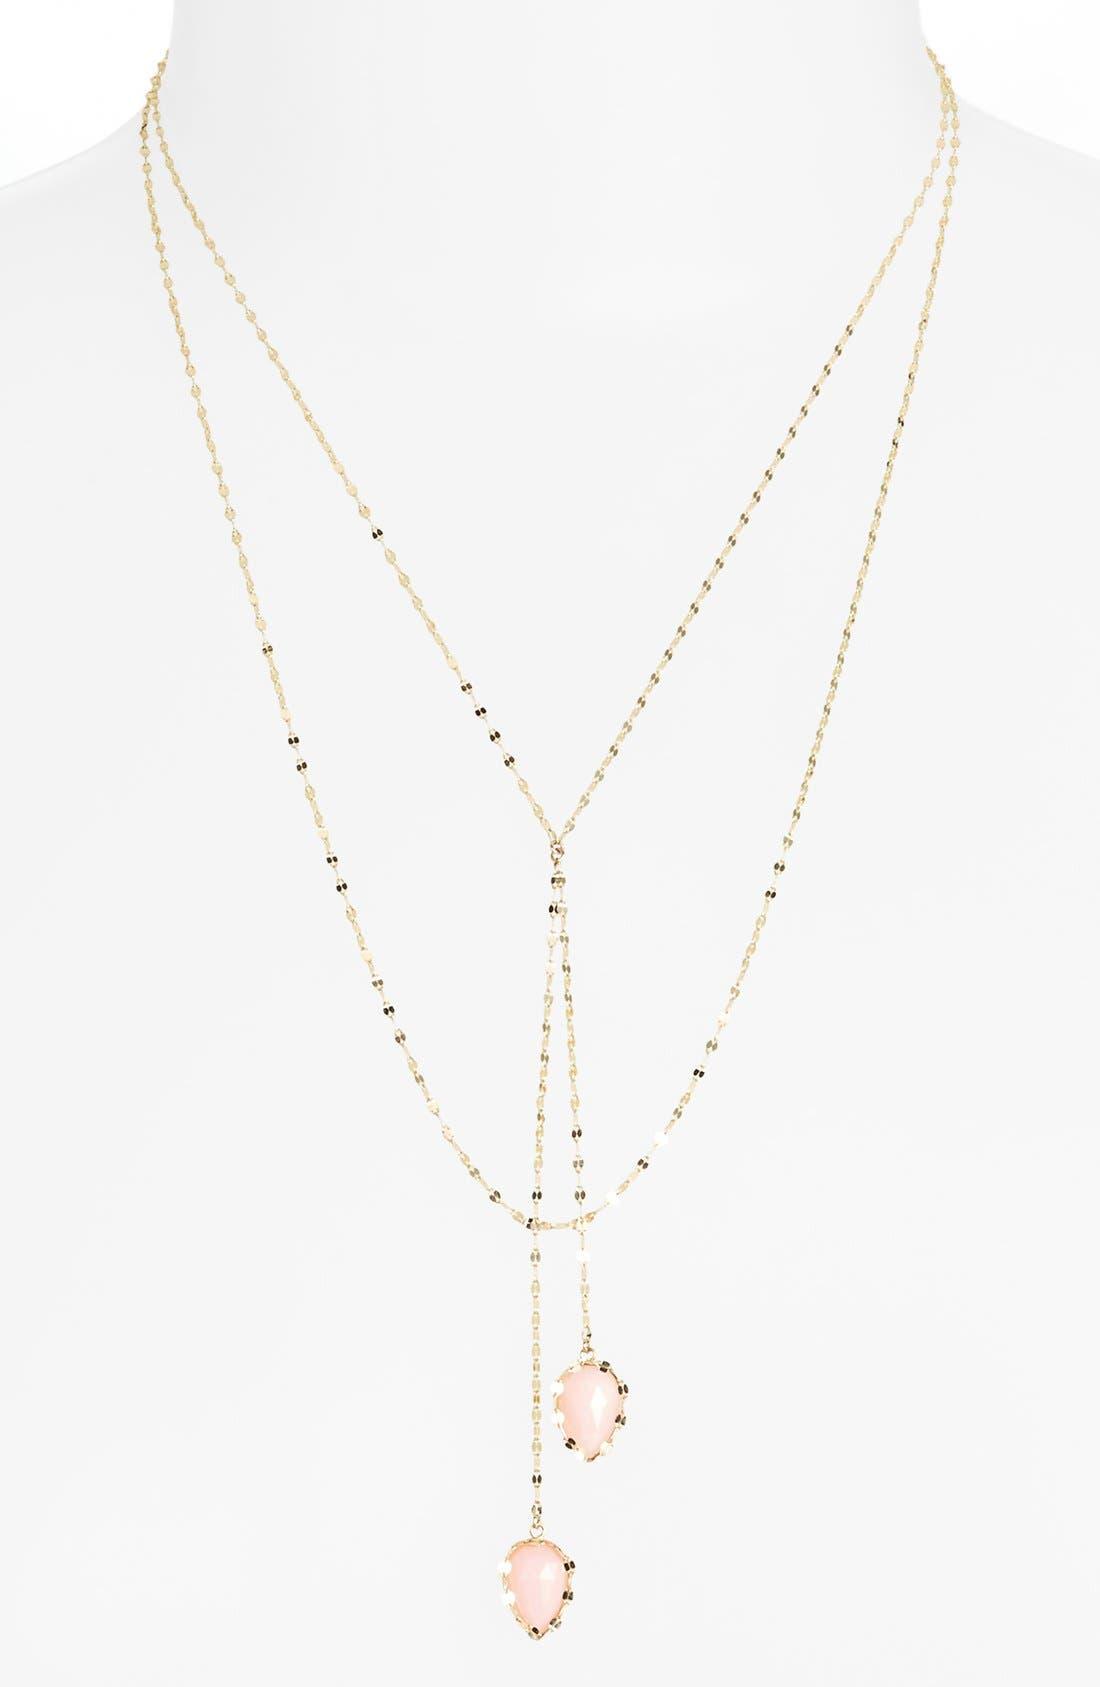 Main Image - Lana Jewelry 'Blake' Lariat Necklace